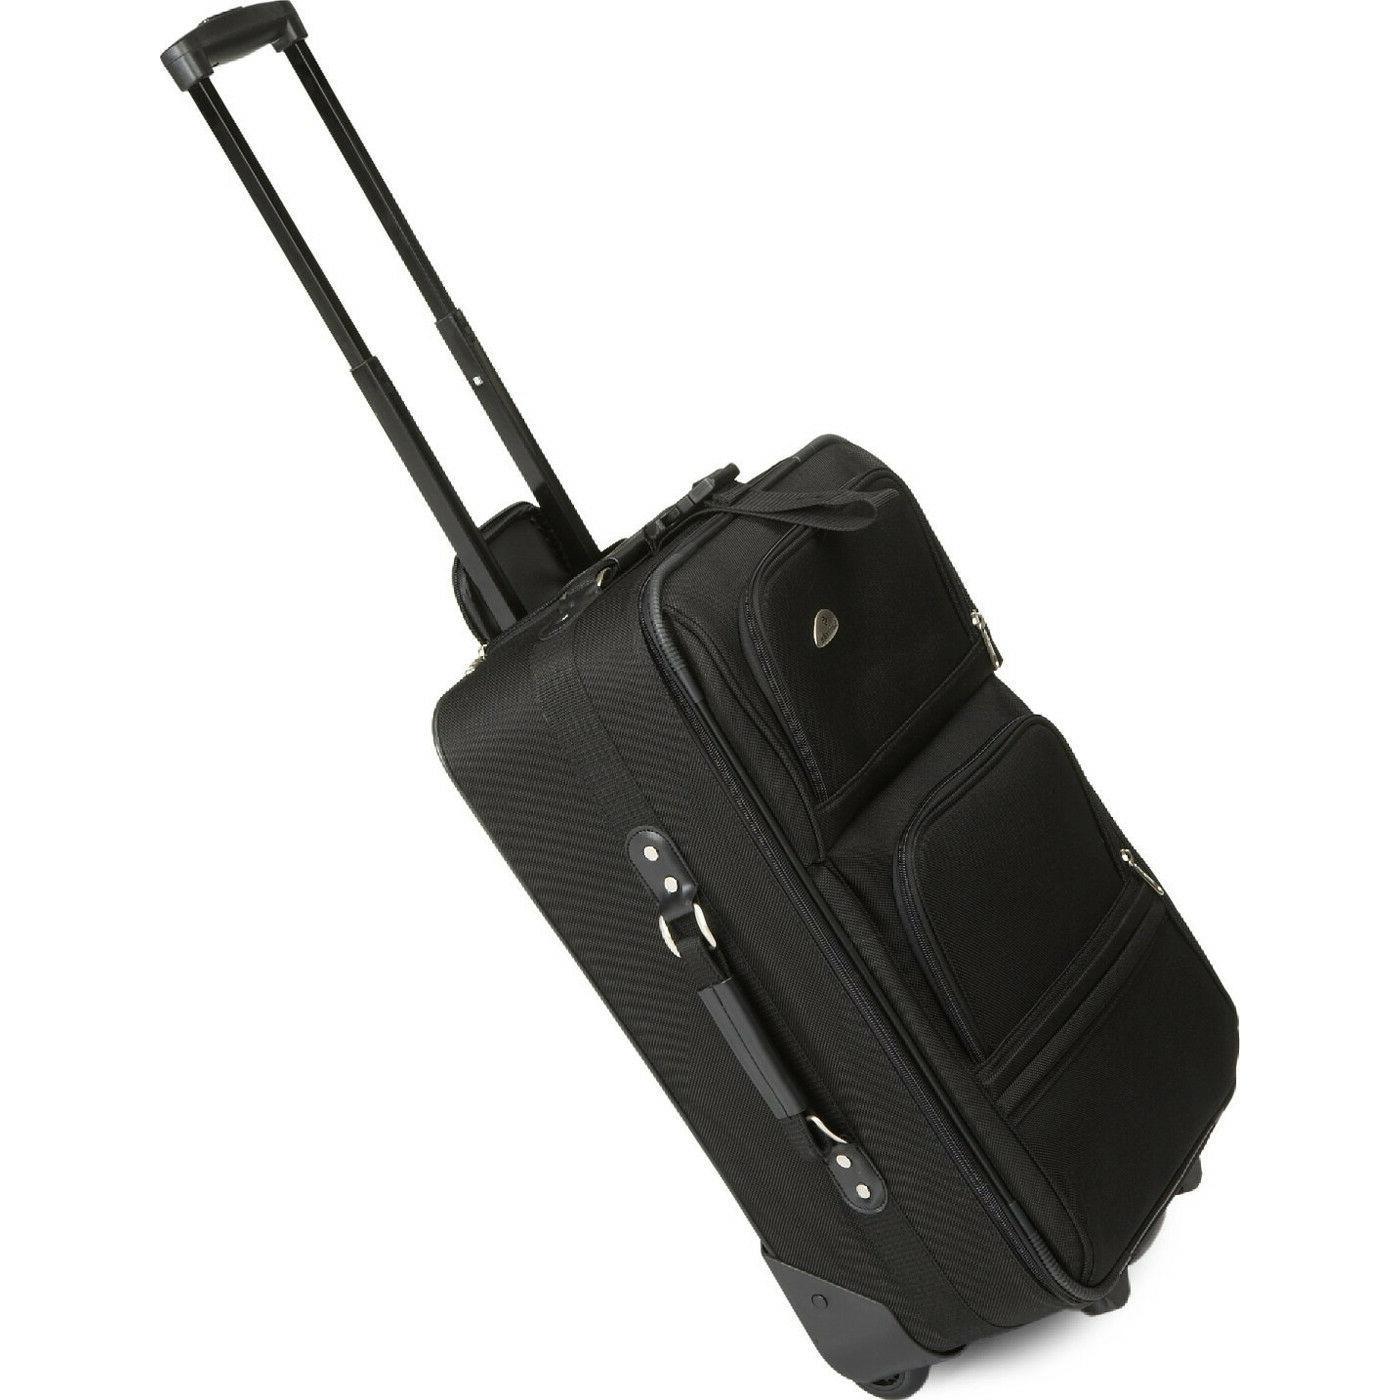 Samsonite 5 Luggage - 25 Inch, 20 & More